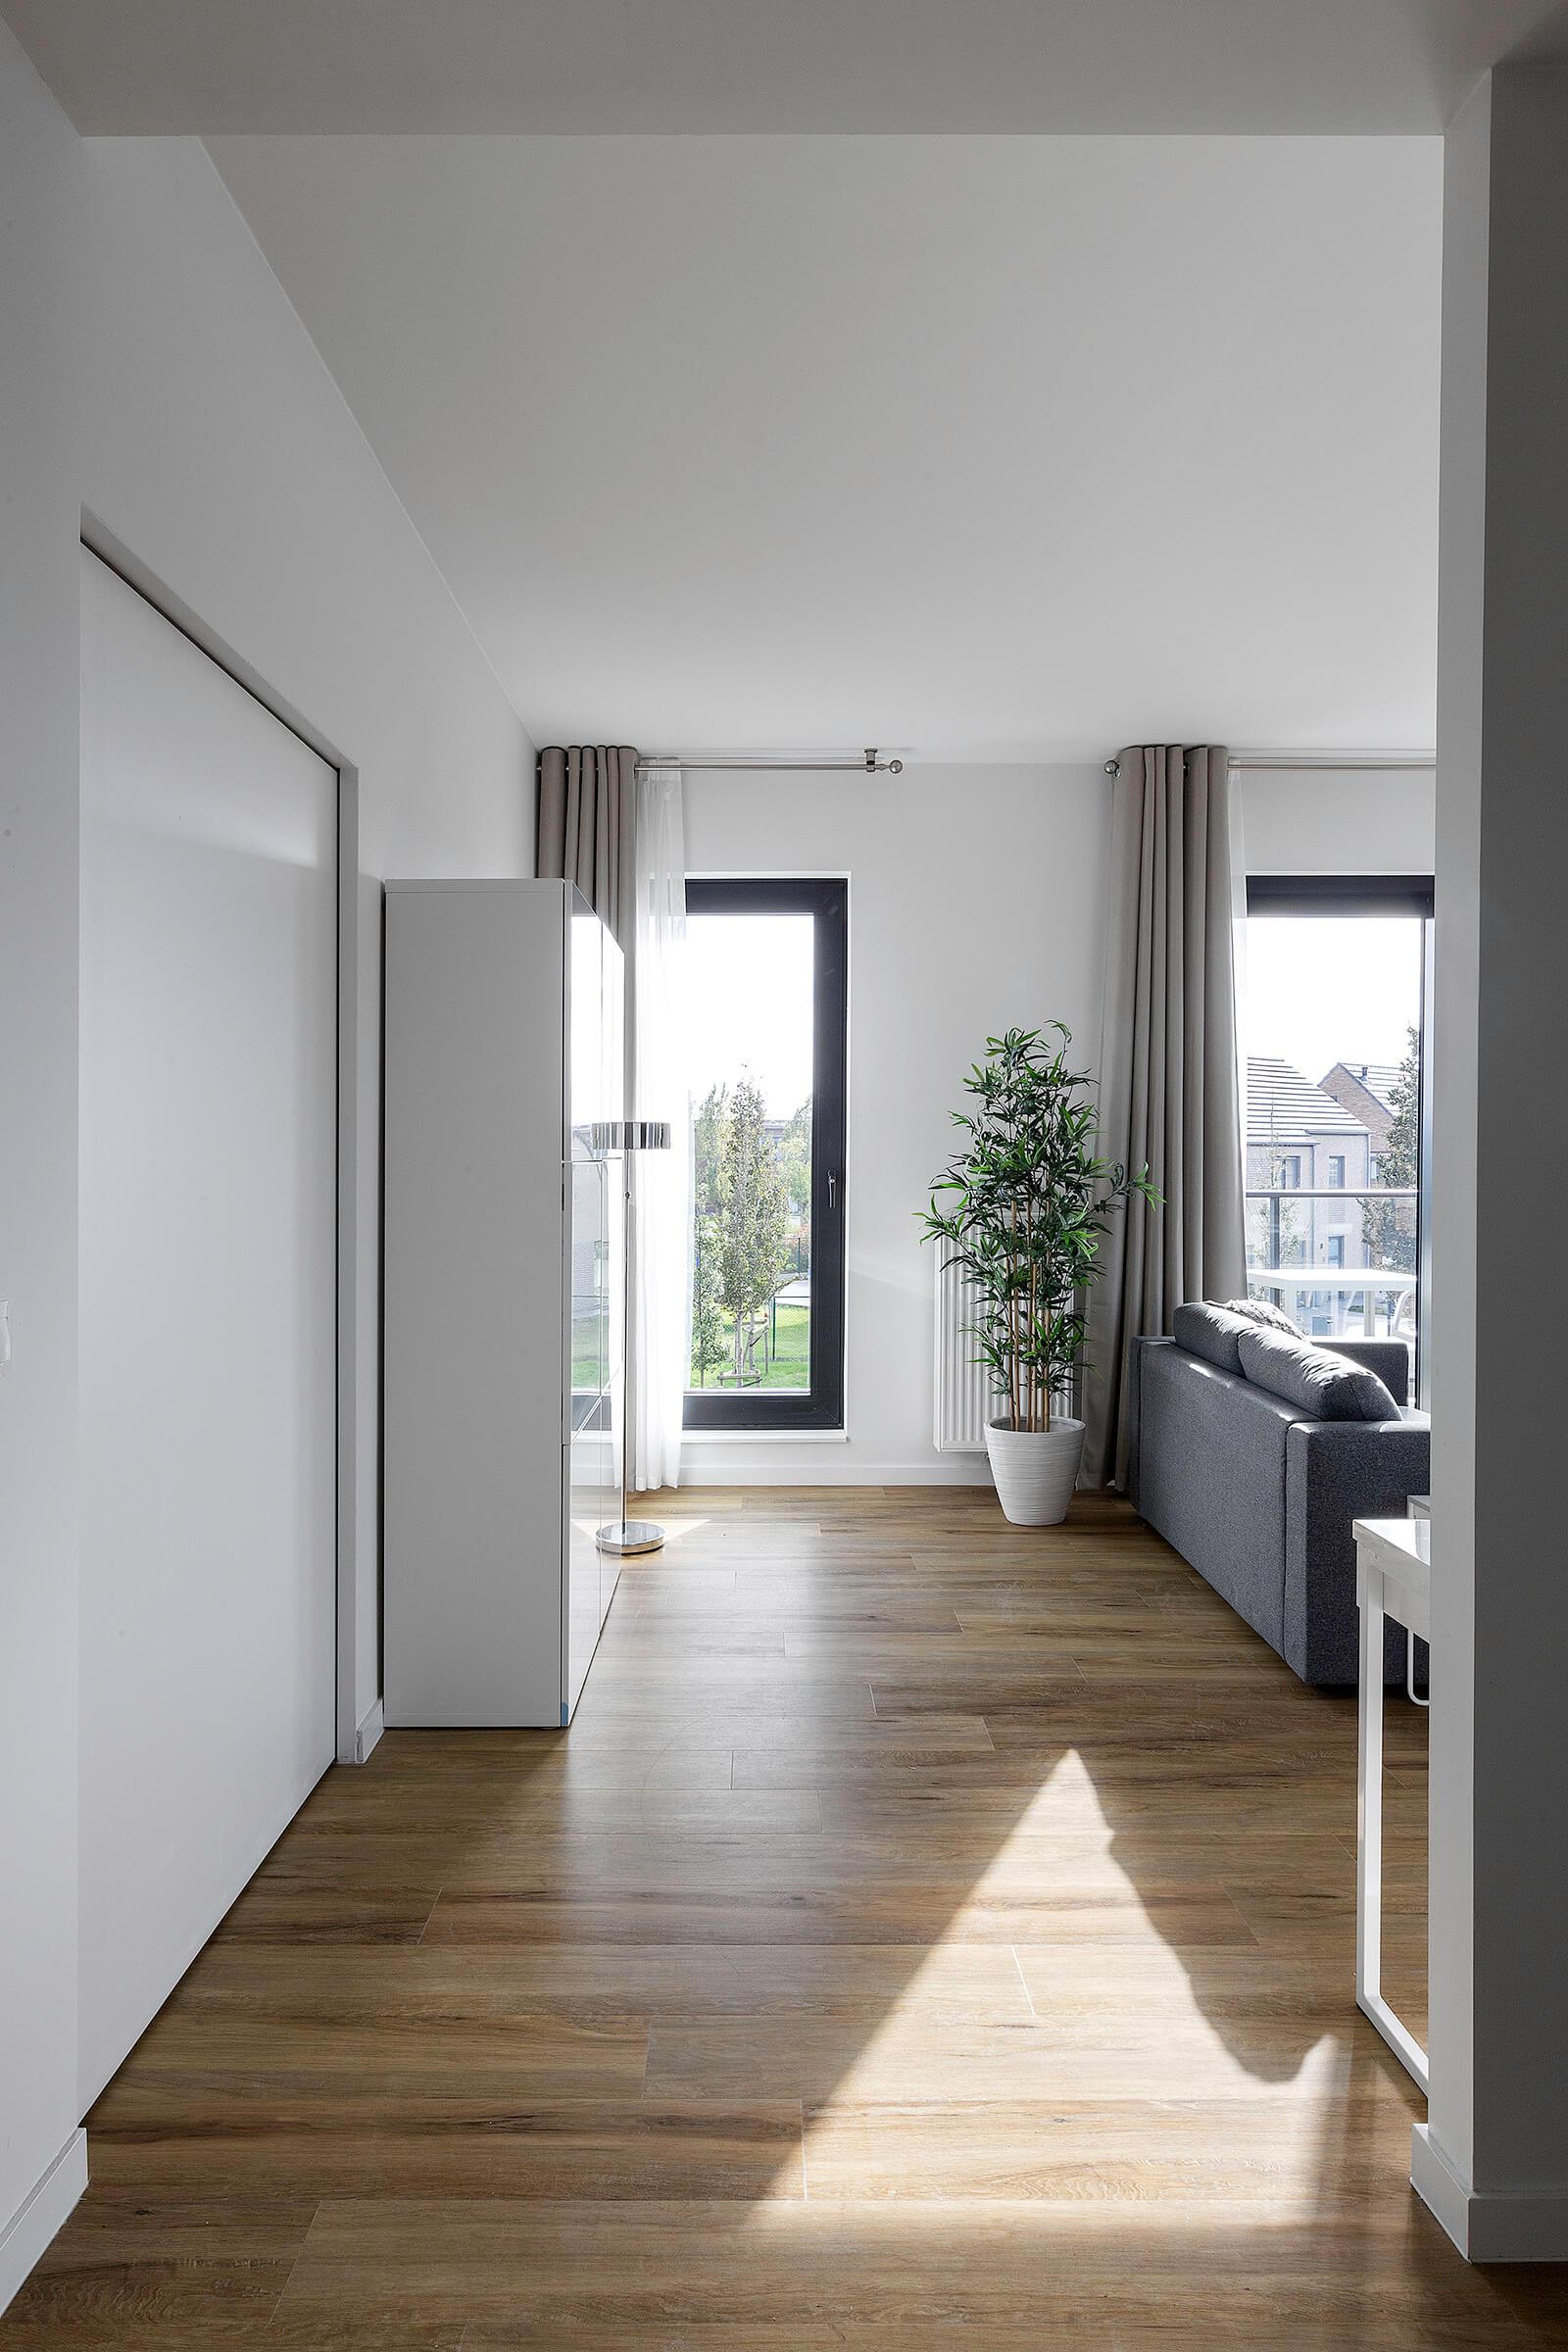 Ibens_Residentie Mercator Oostende